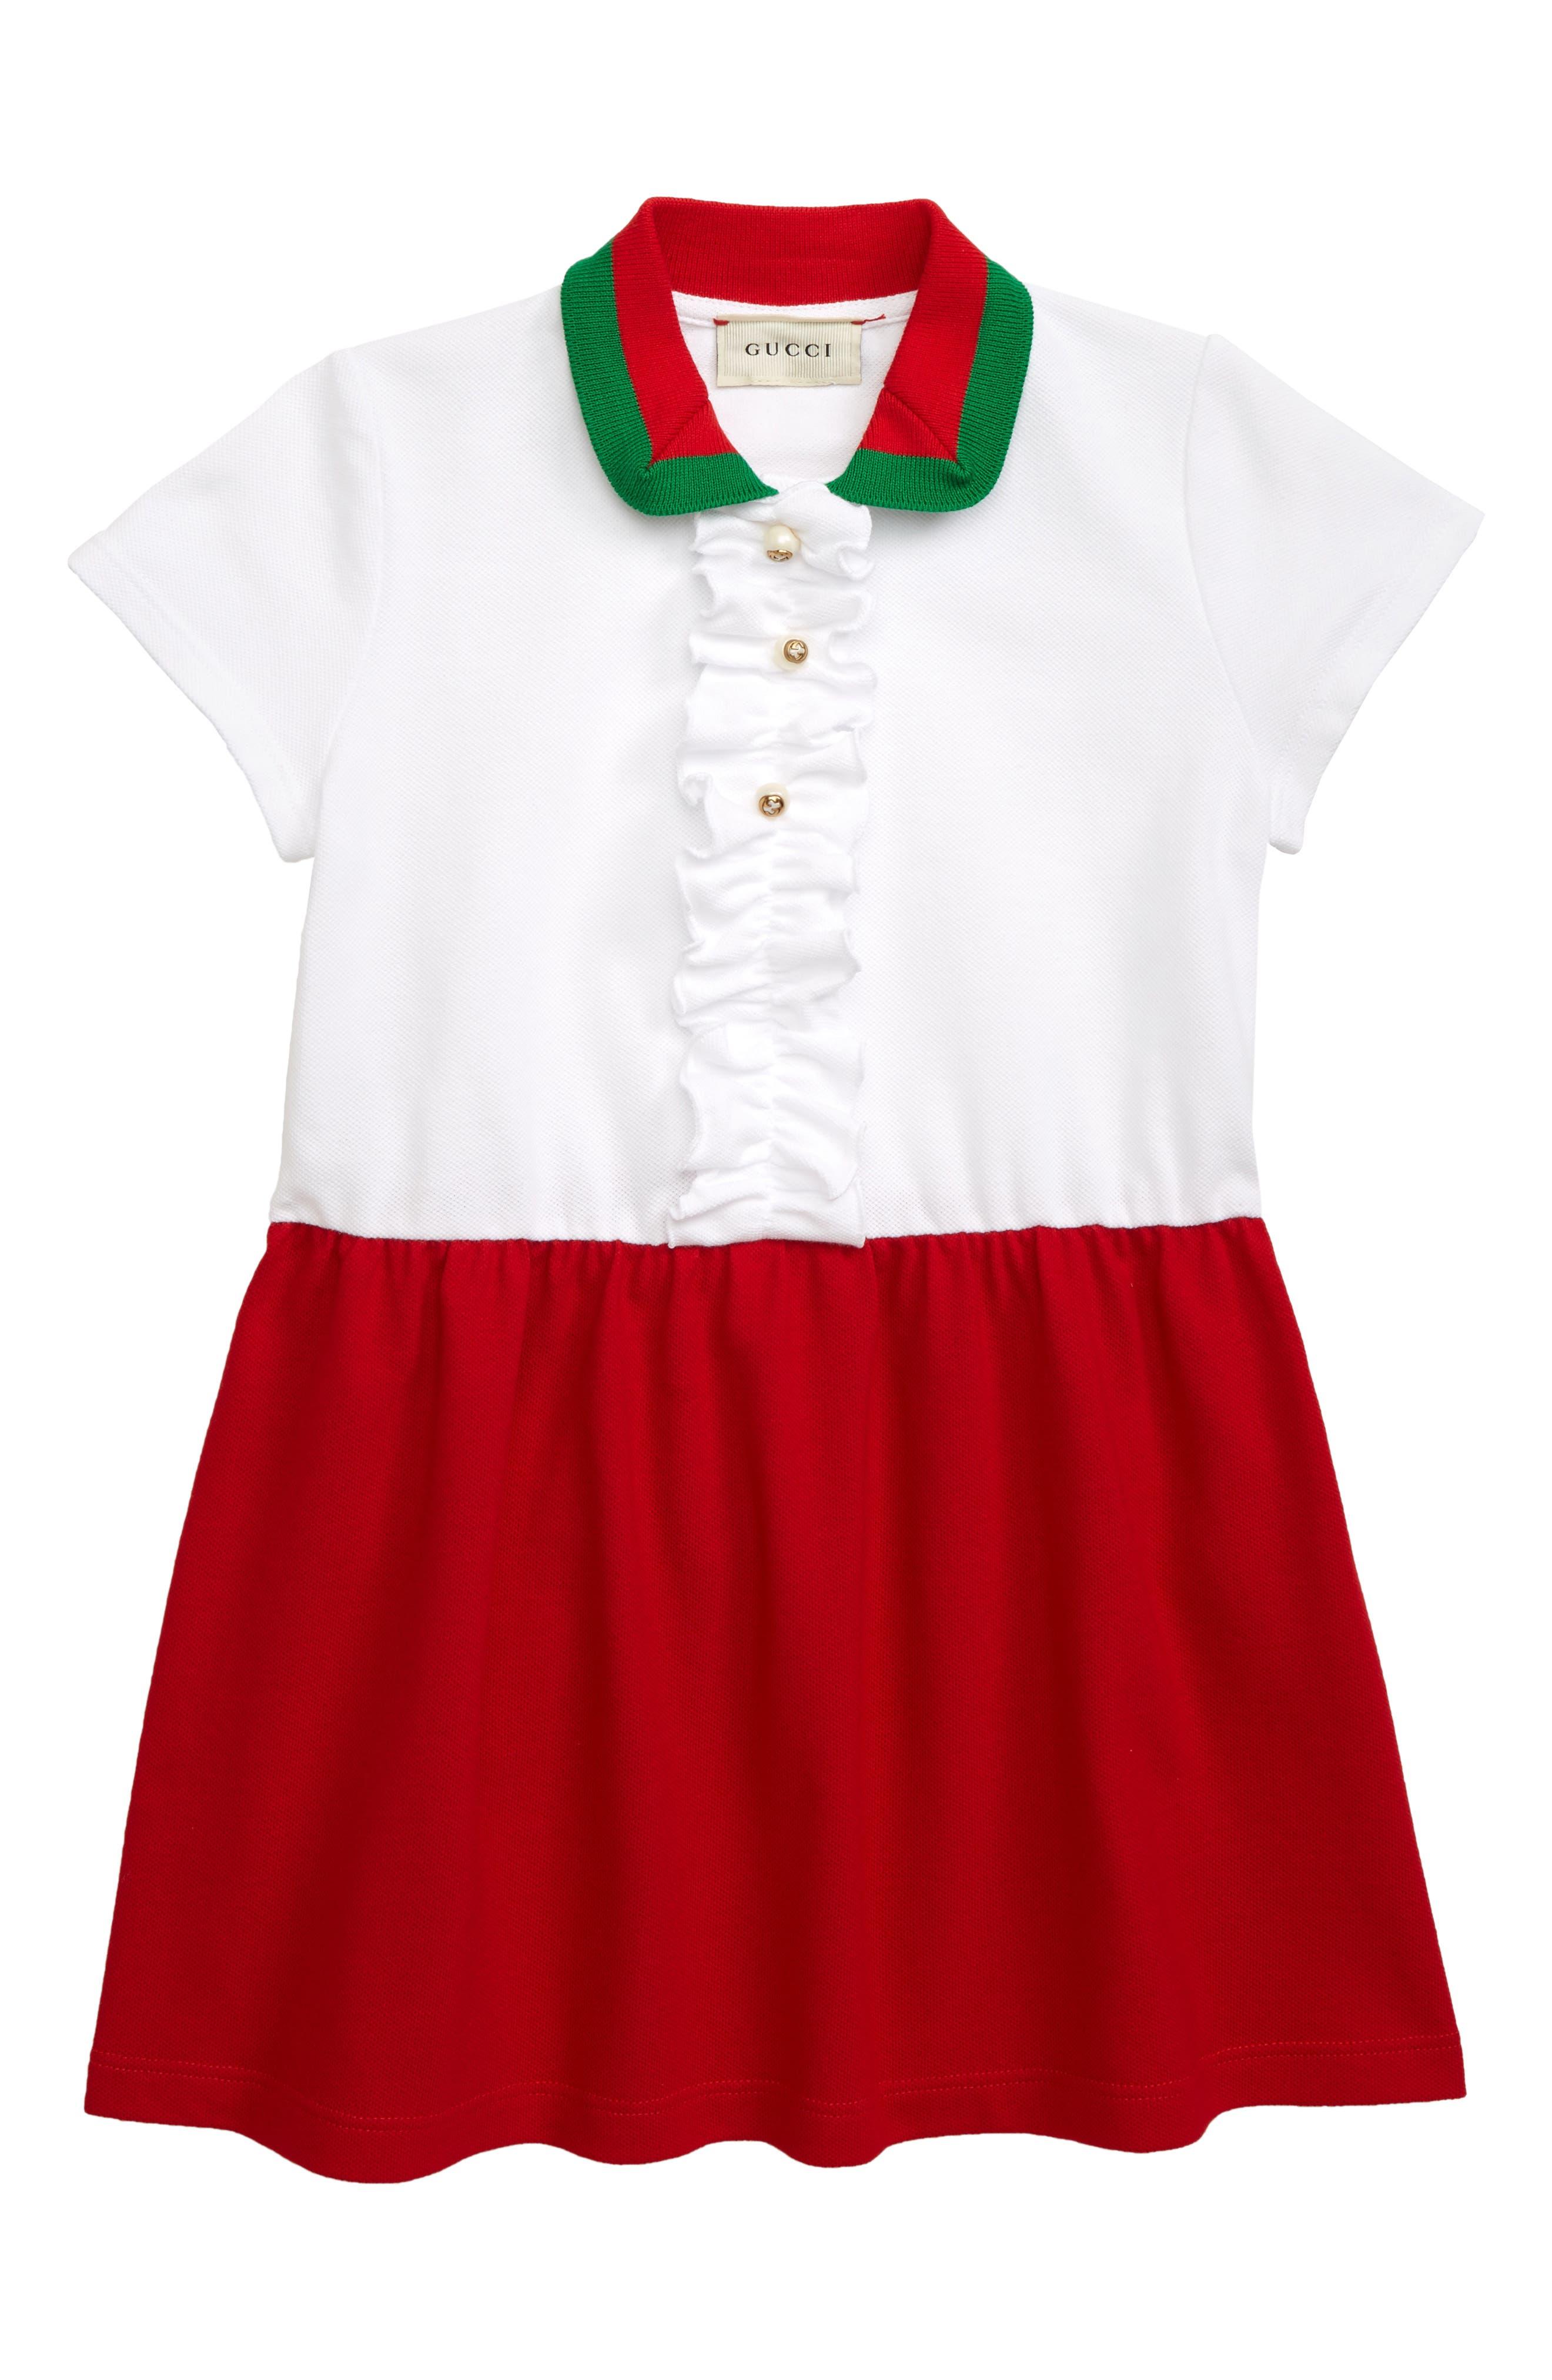 759d3faac Girl's Gucci Colorblock Pique Dress, Y - White